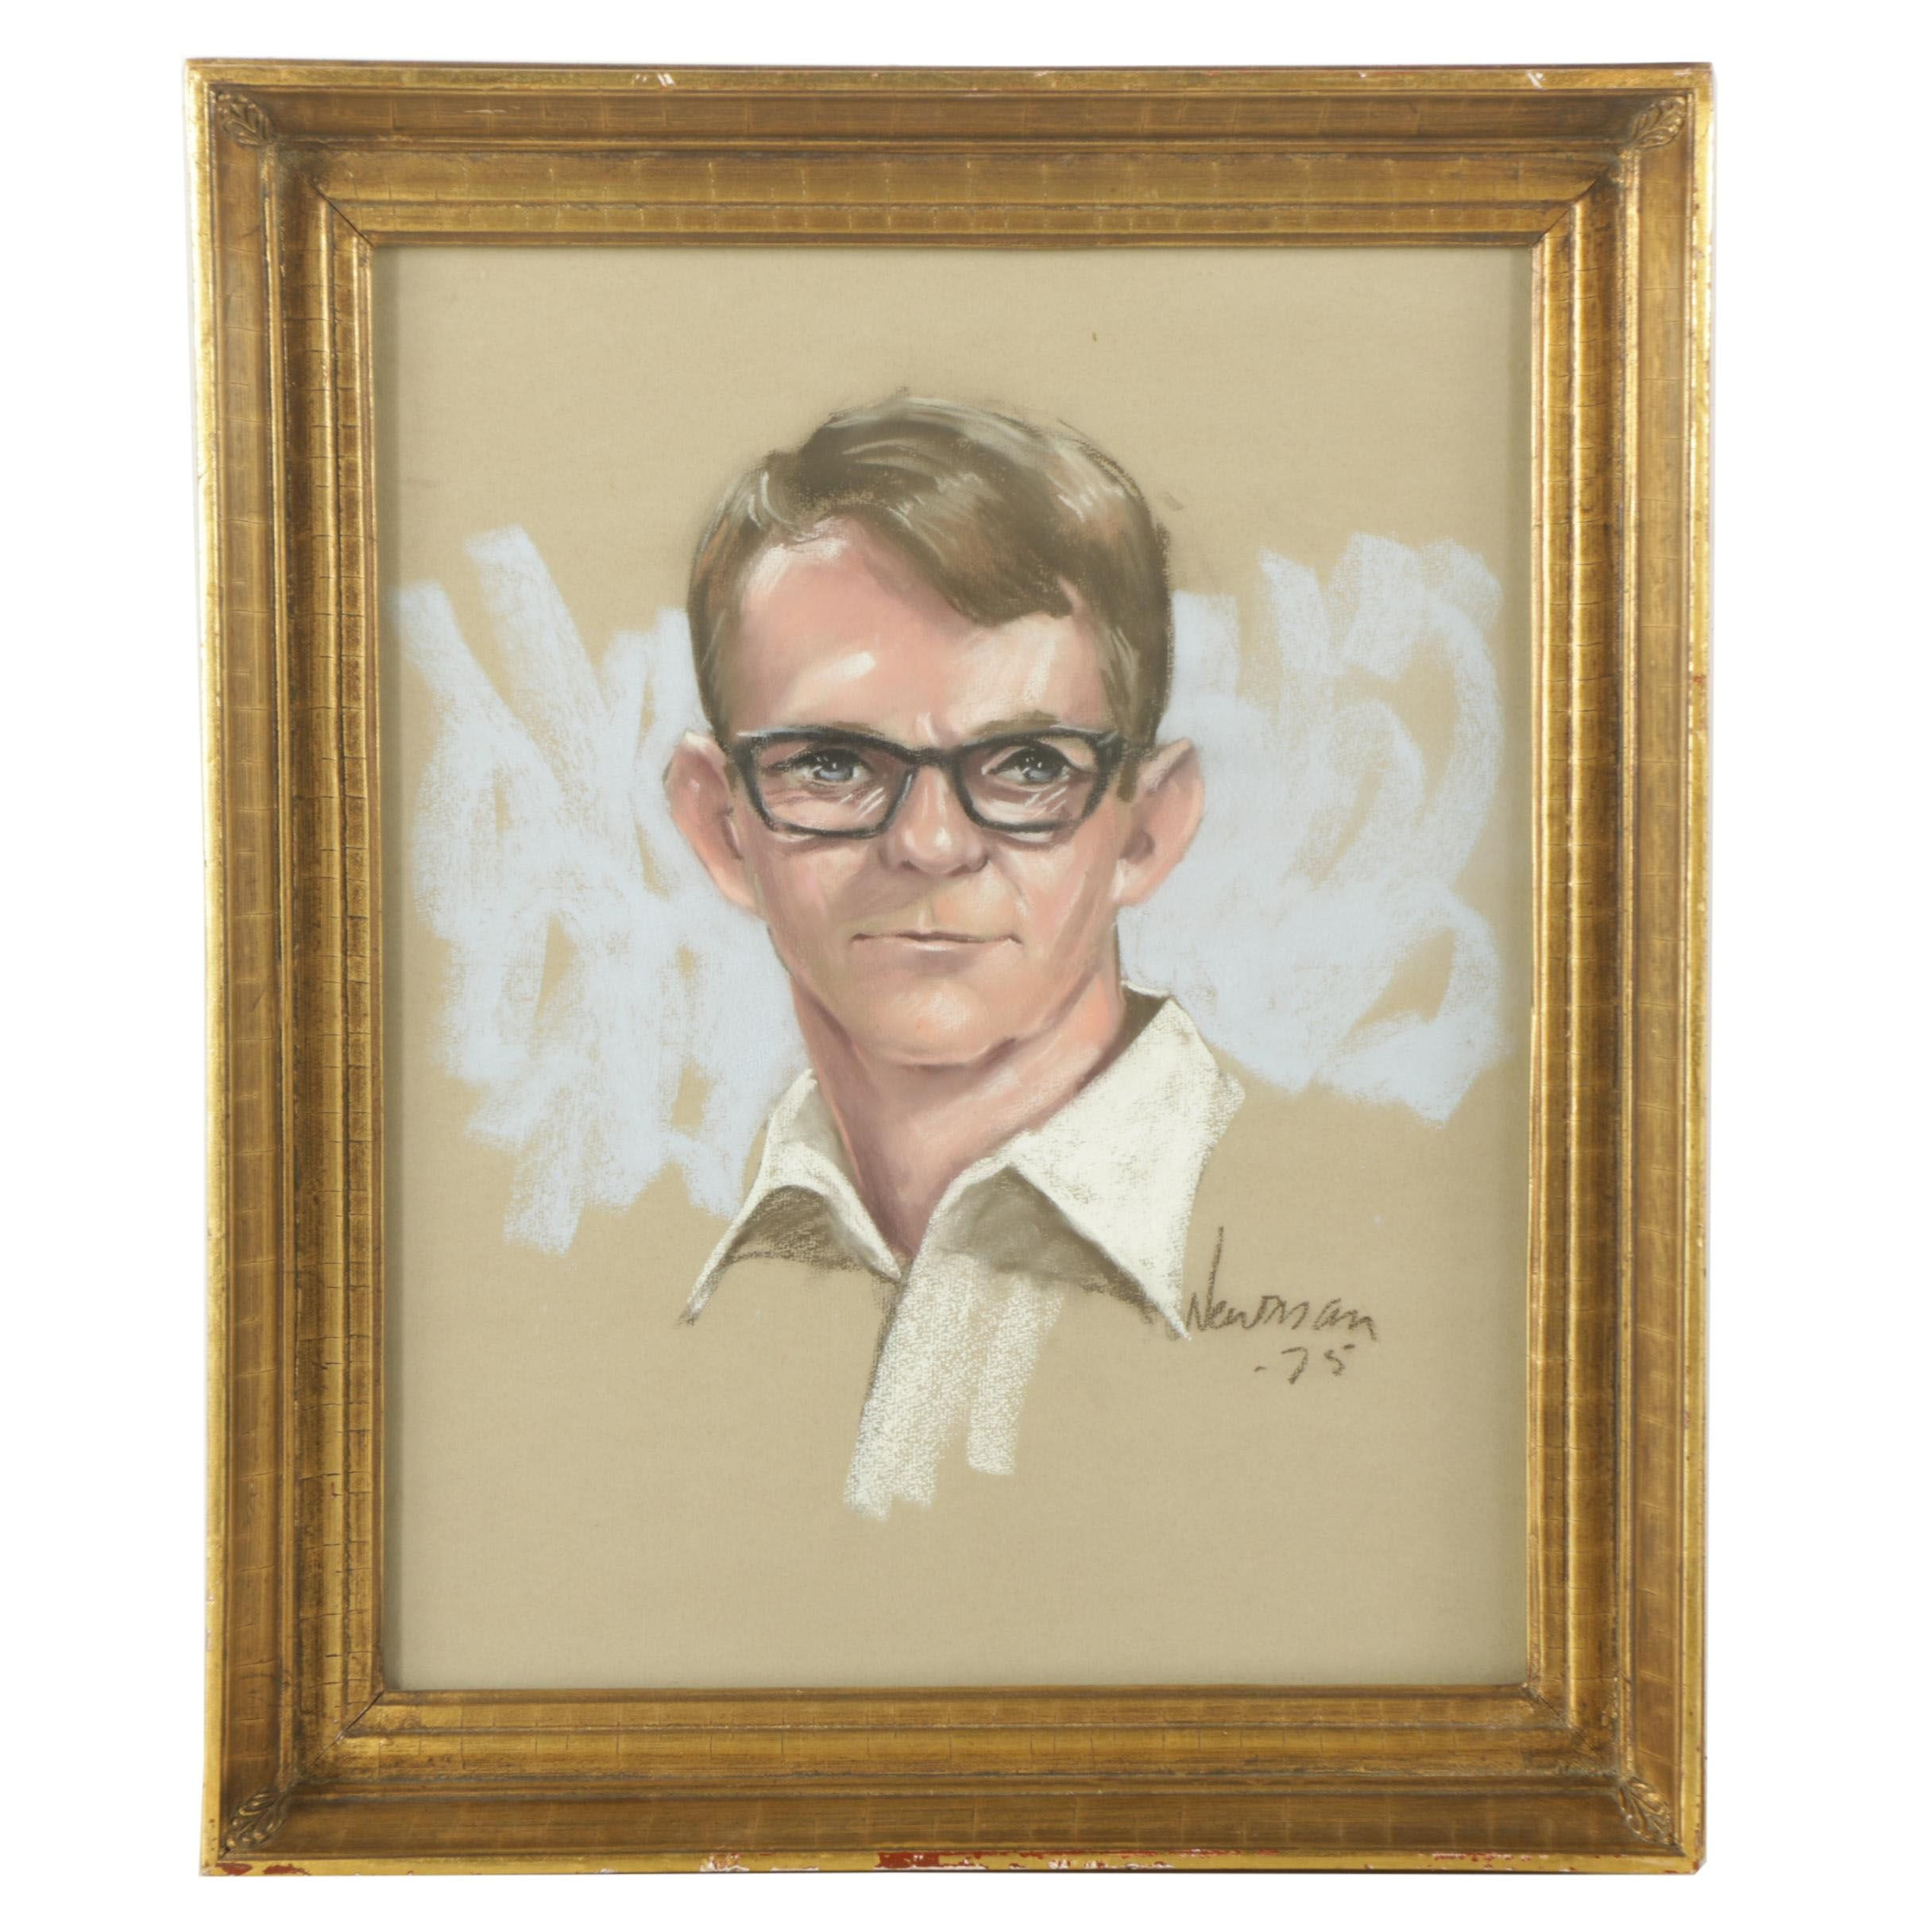 1975 Newman Chalk Pastel Portrait of a Man